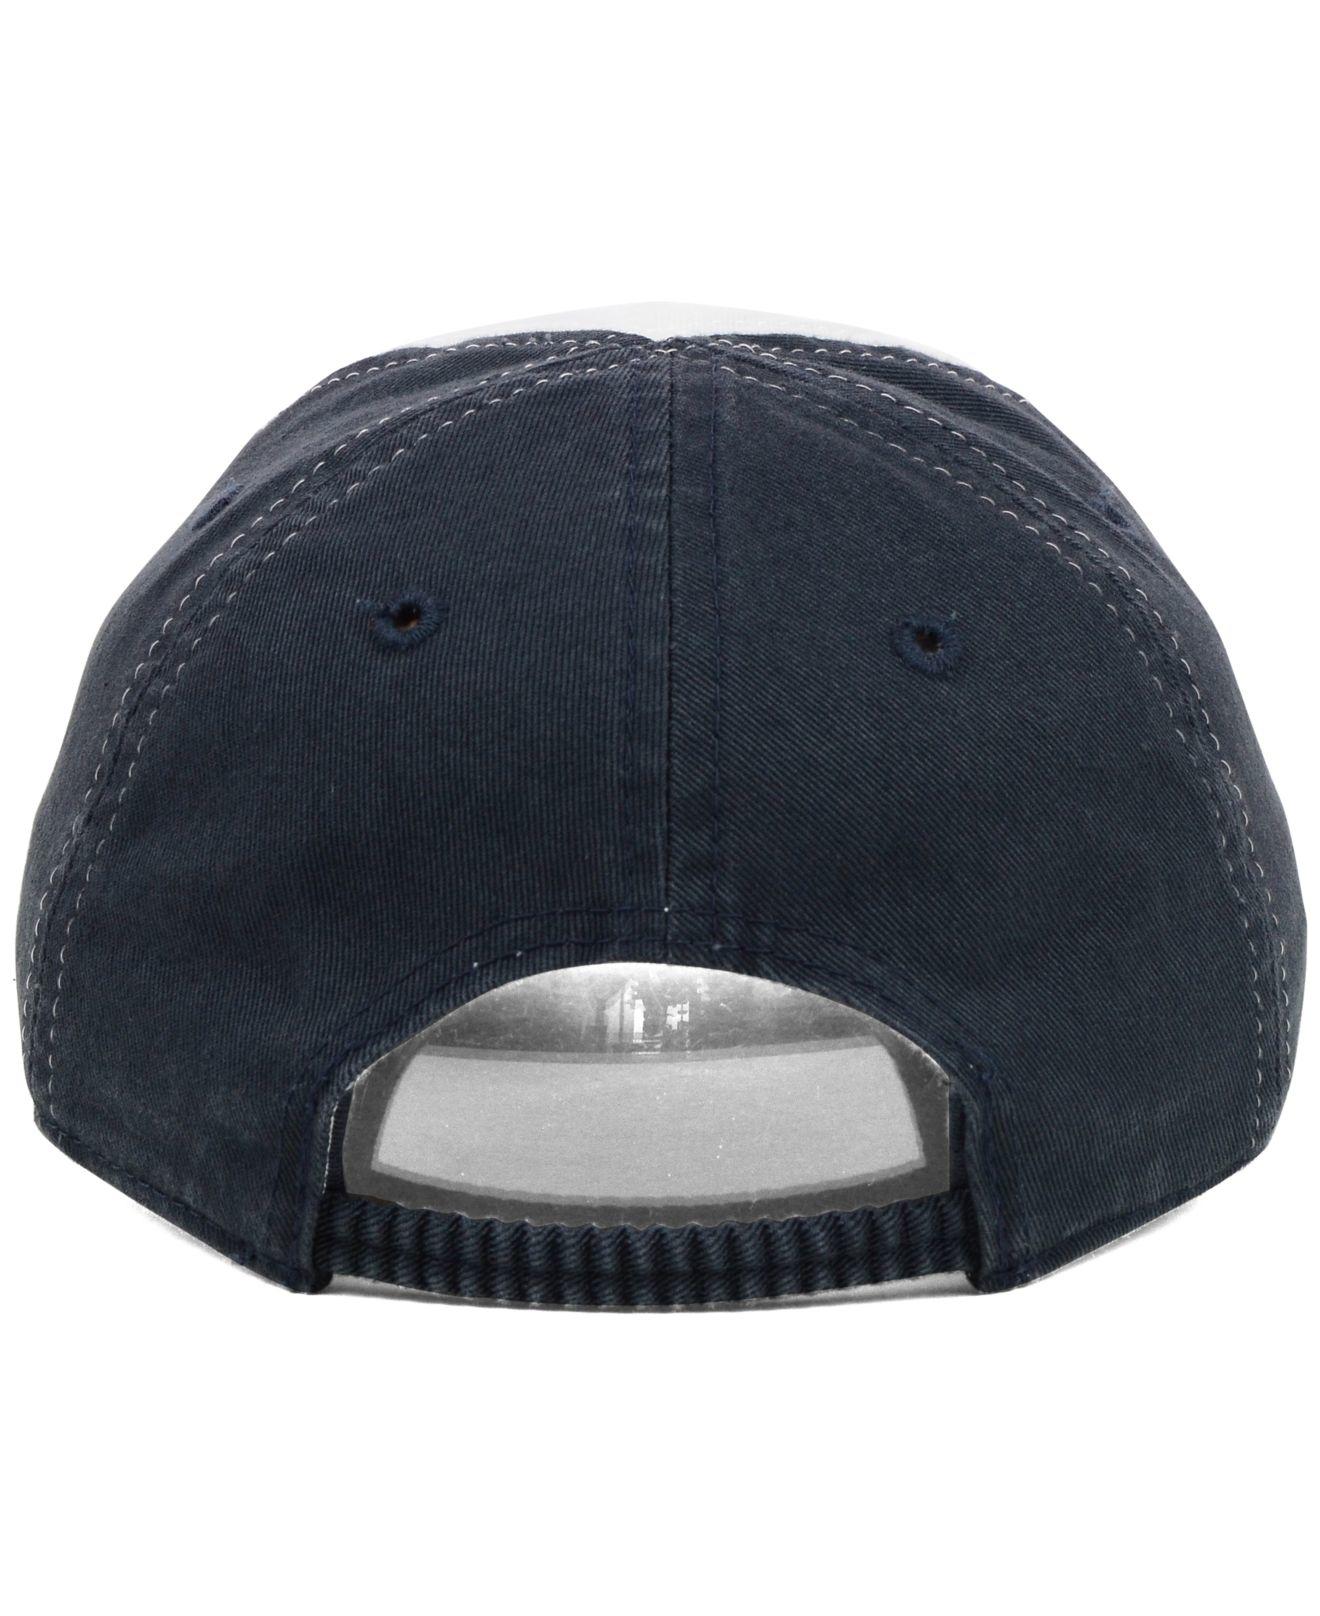 6612191c99e free shipping red sox hat low crown jewels 4f7d0 9fb1b